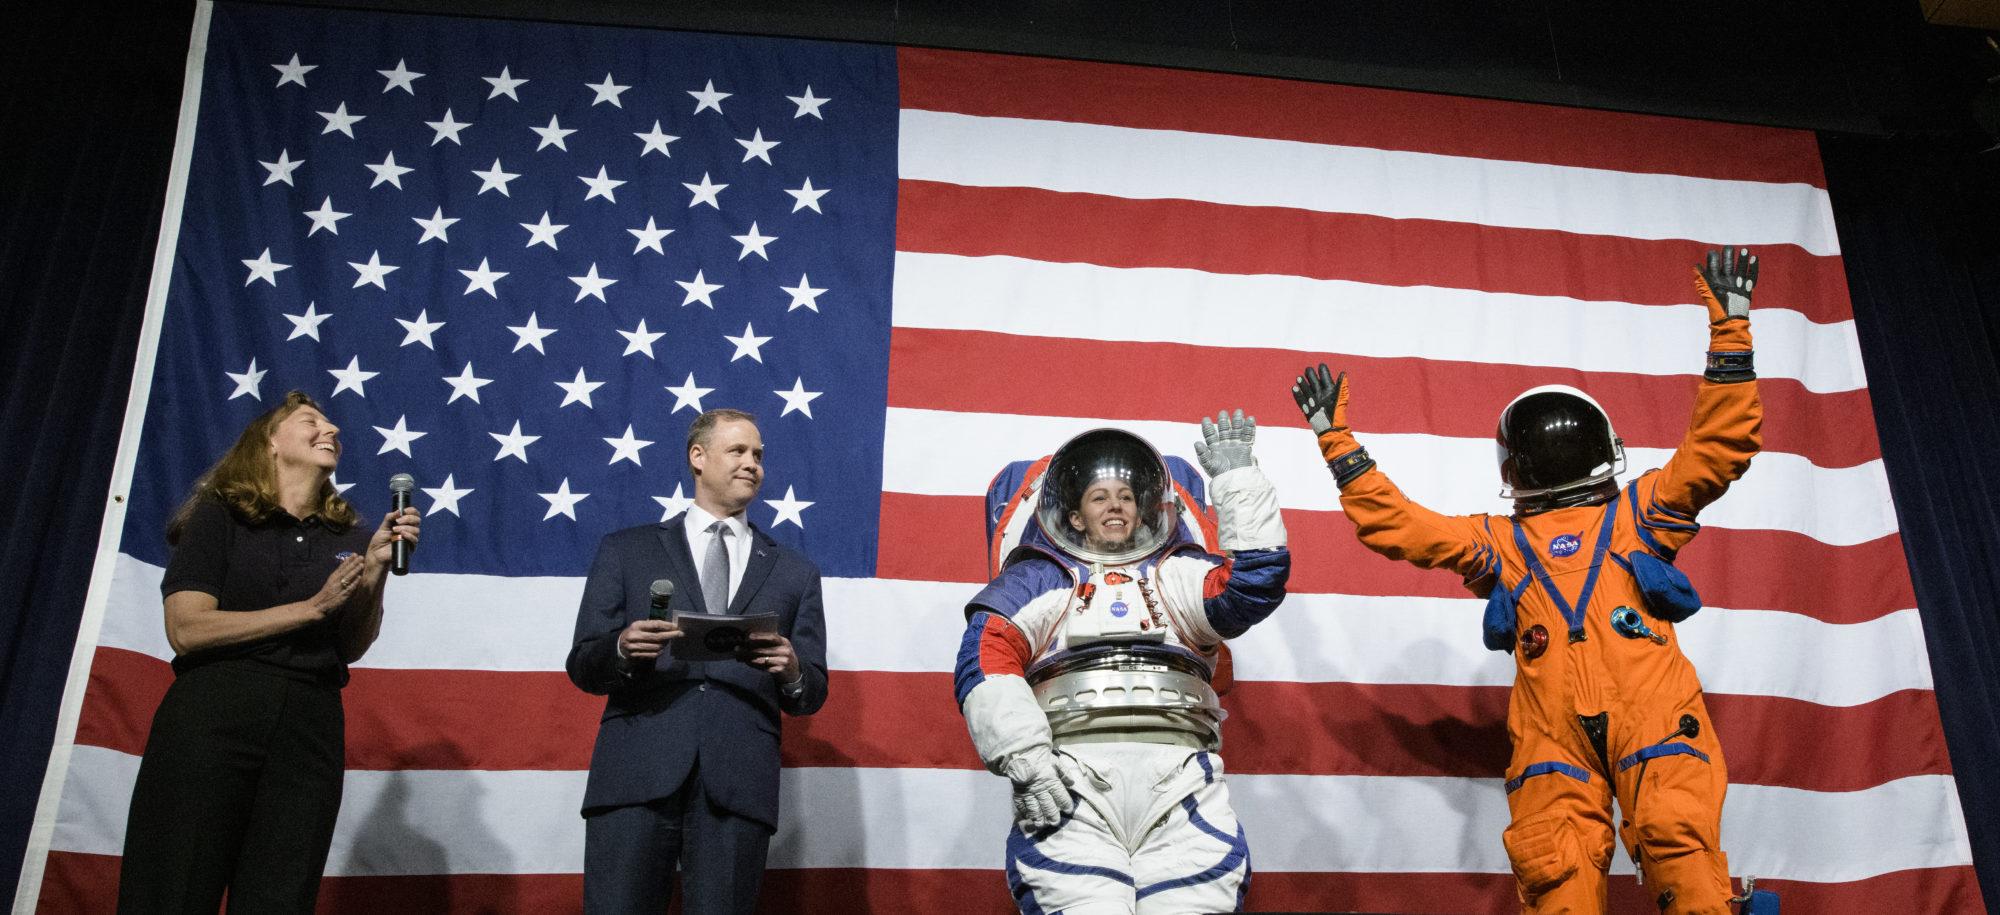 NASA влаштувало показ місячної моди (ФОТО) - космос, NASA - 16 skafandr 2000x915